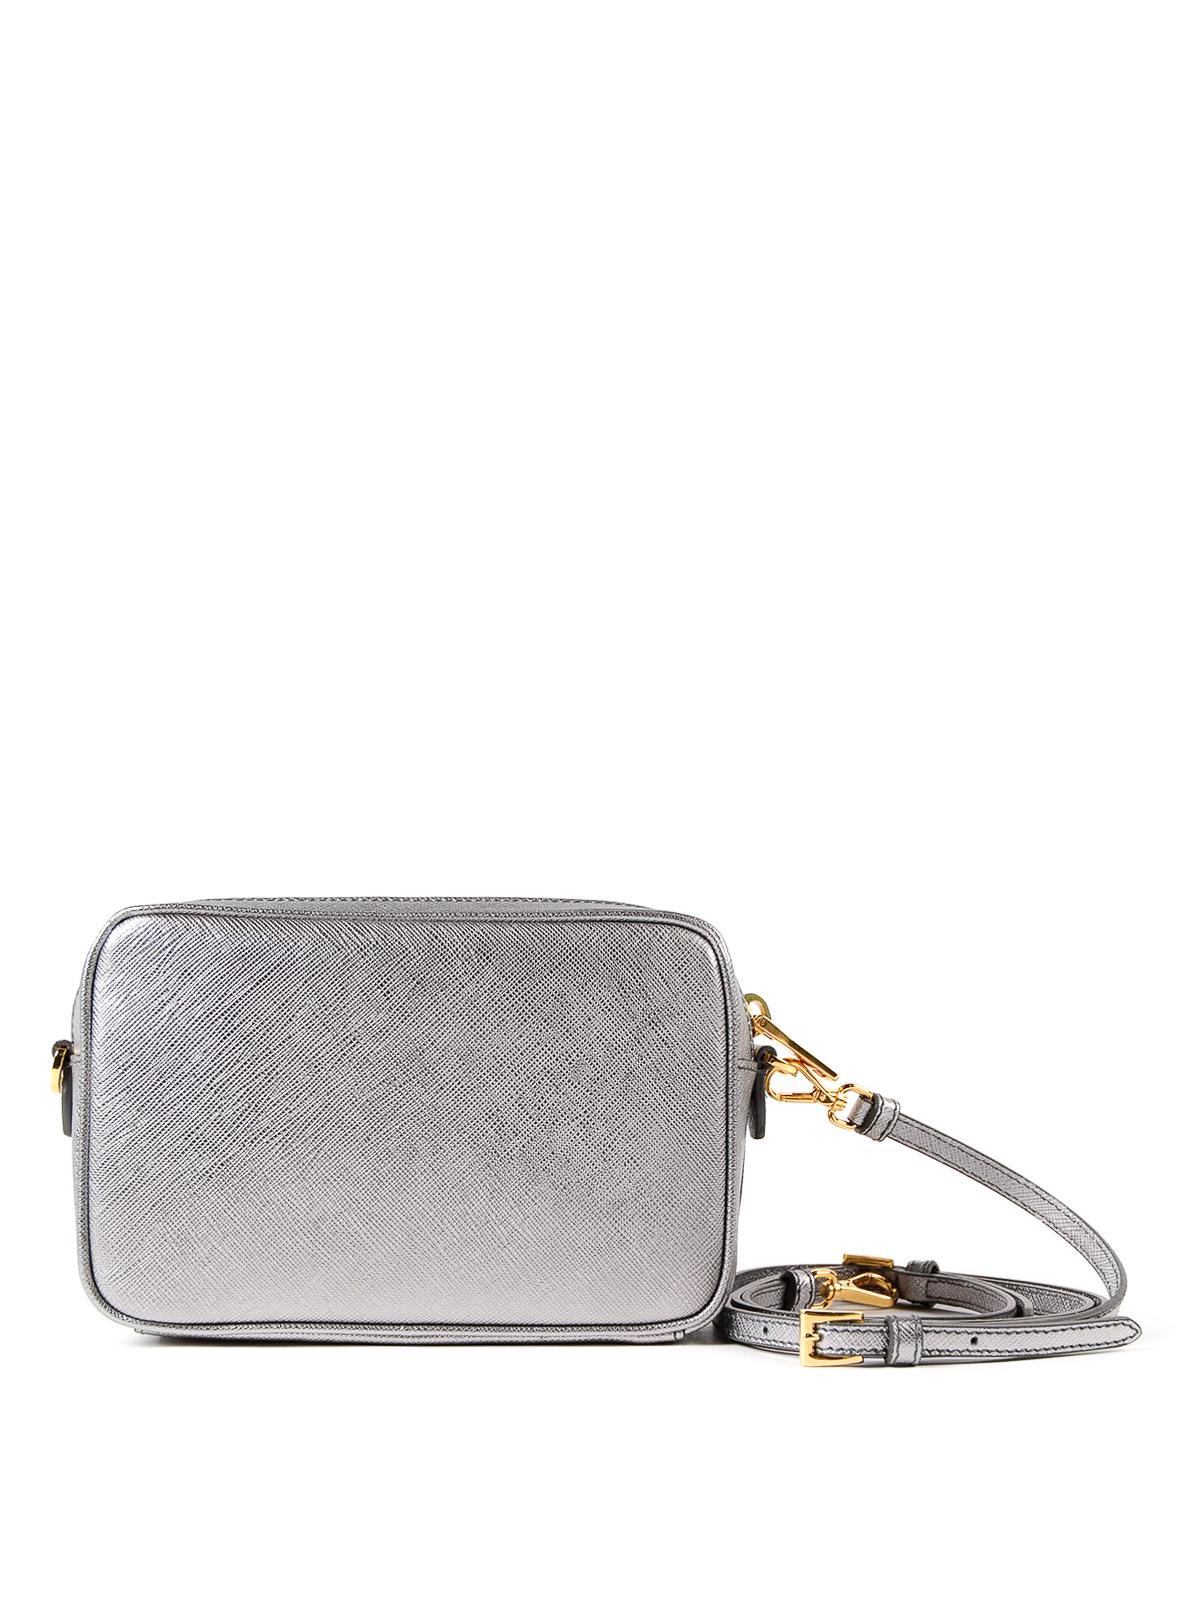 96685cf8d7fec2 iKRIX PRADA: cross body bags - Silver saffiano leather crossbody